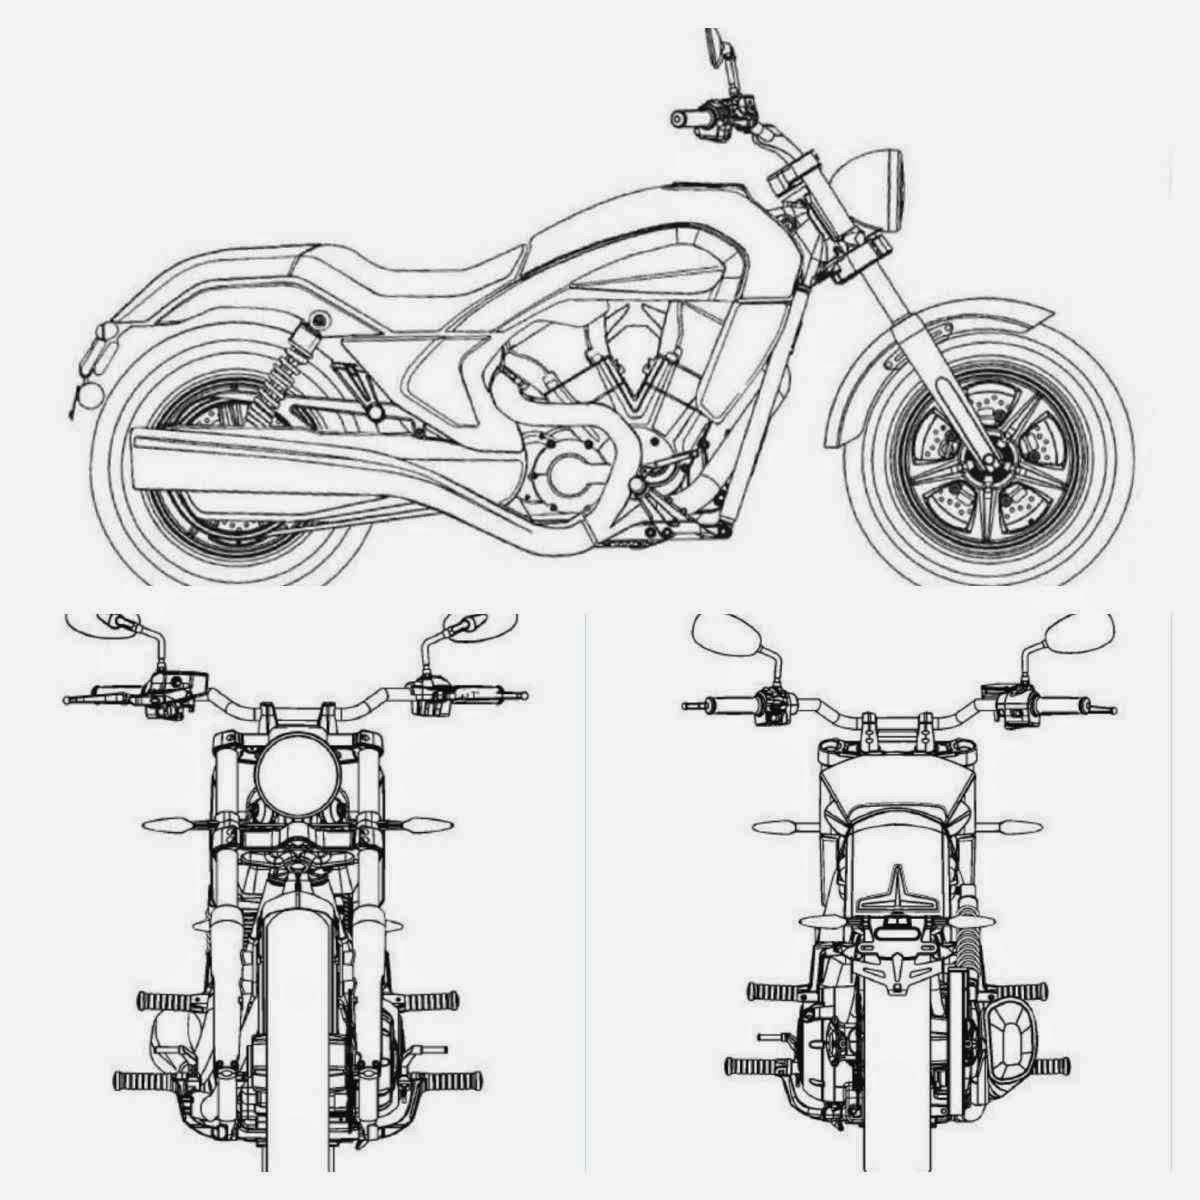 Design by rich christoph